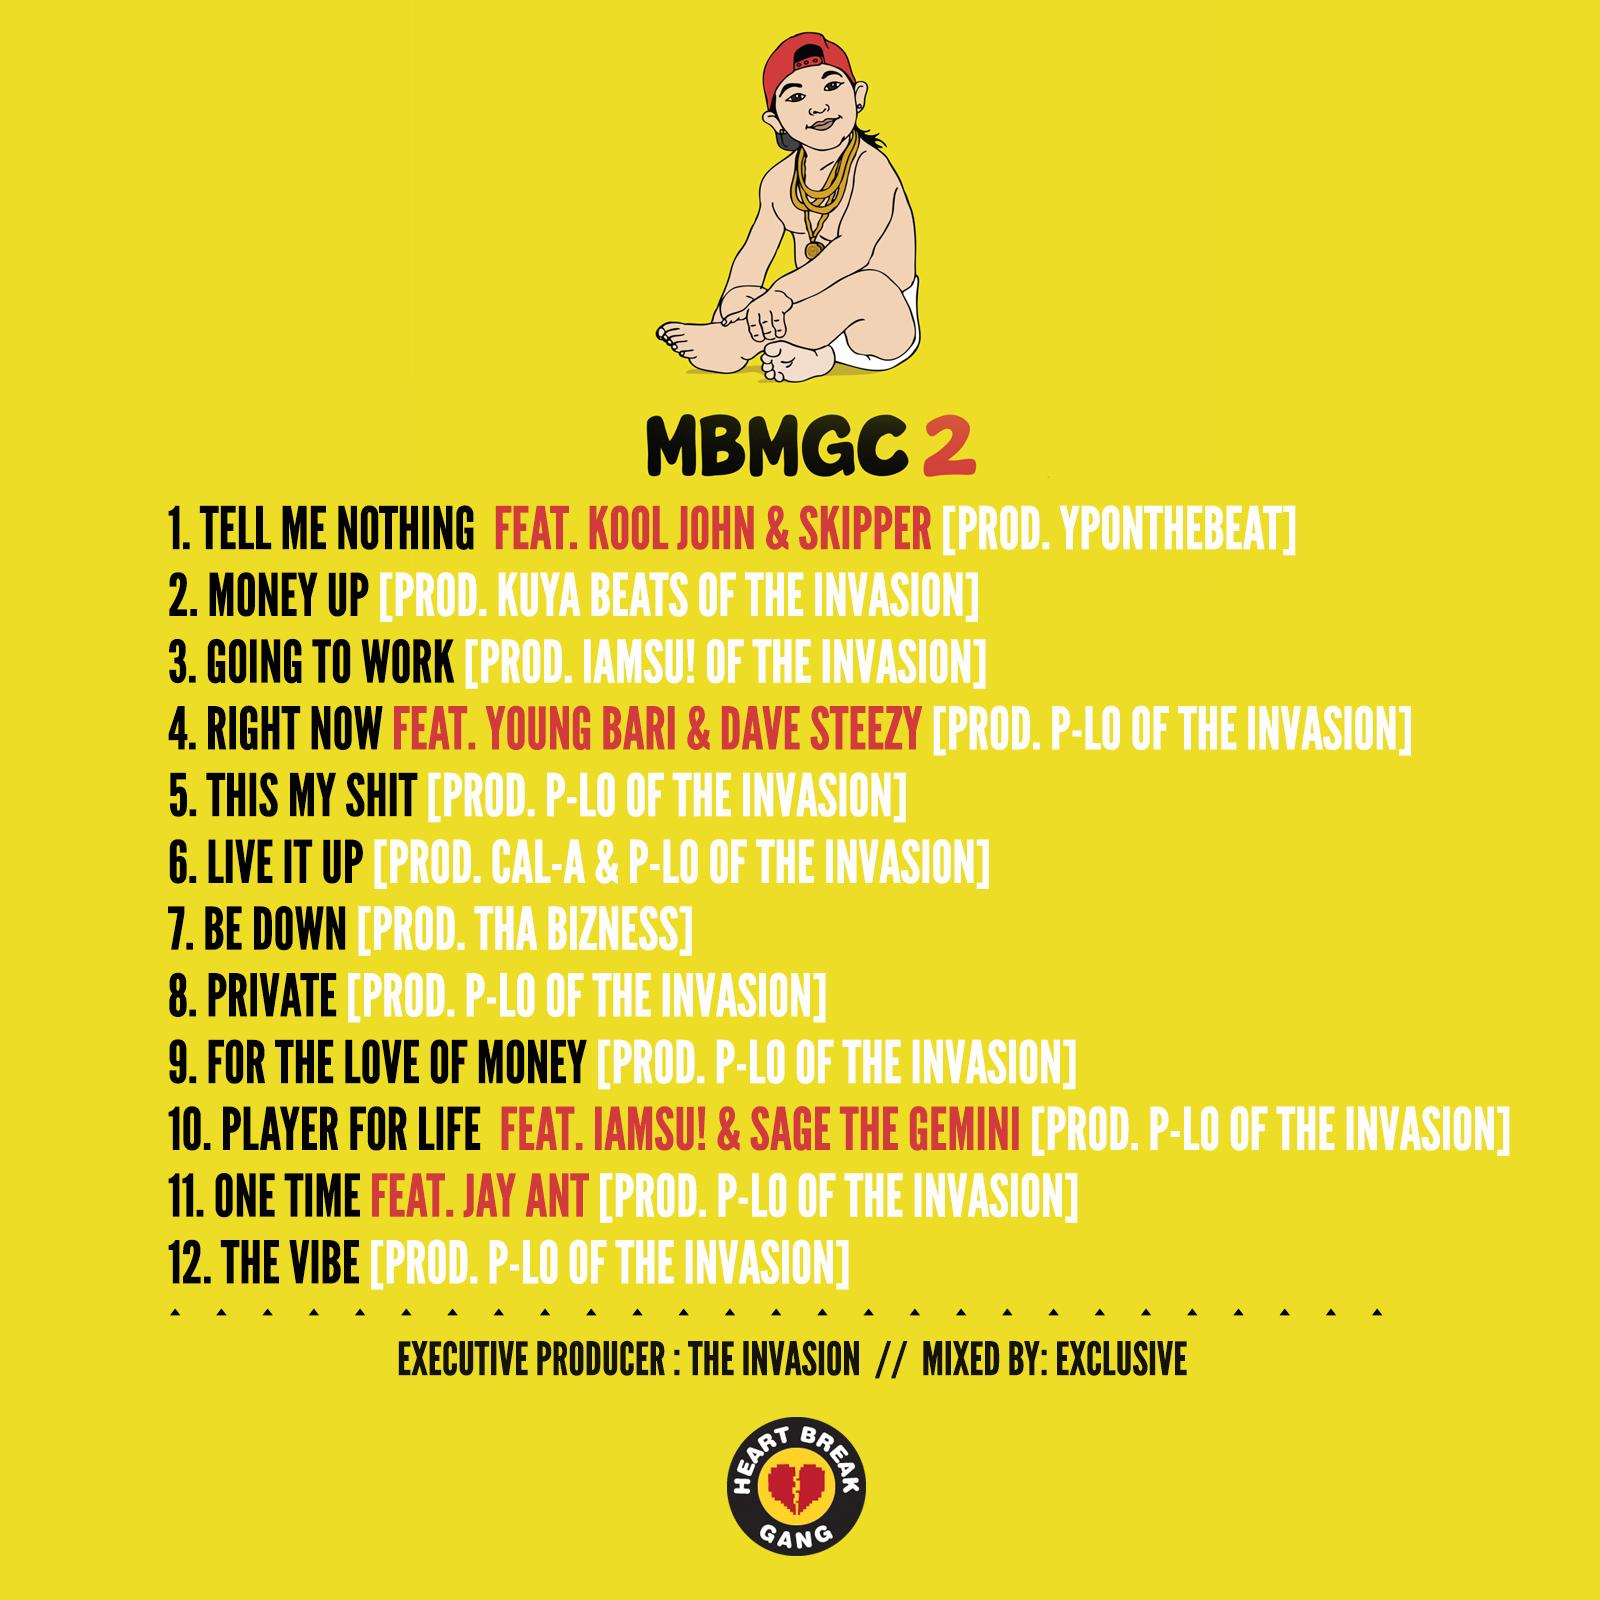 MBMGC 2 Tracklist